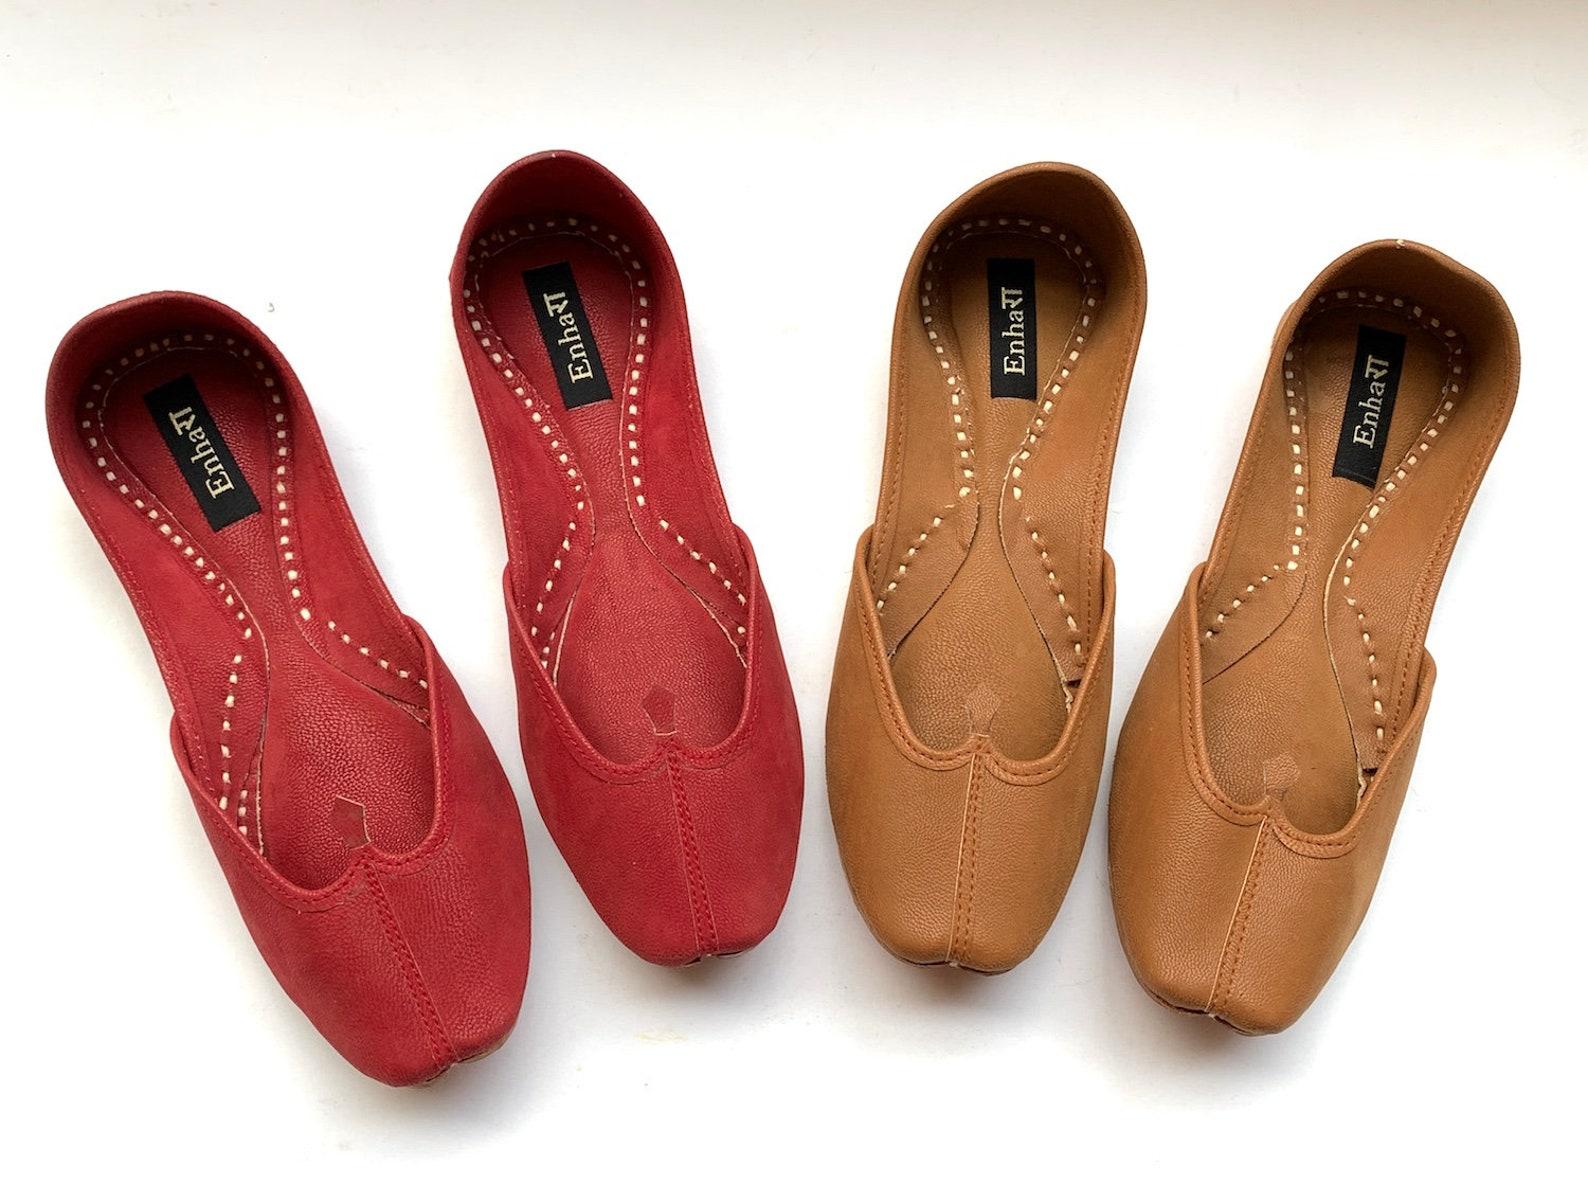 womens tan ballet flat shoes, slip on shoes, indian shoes, handmade designer shoes/juttis or mojaris